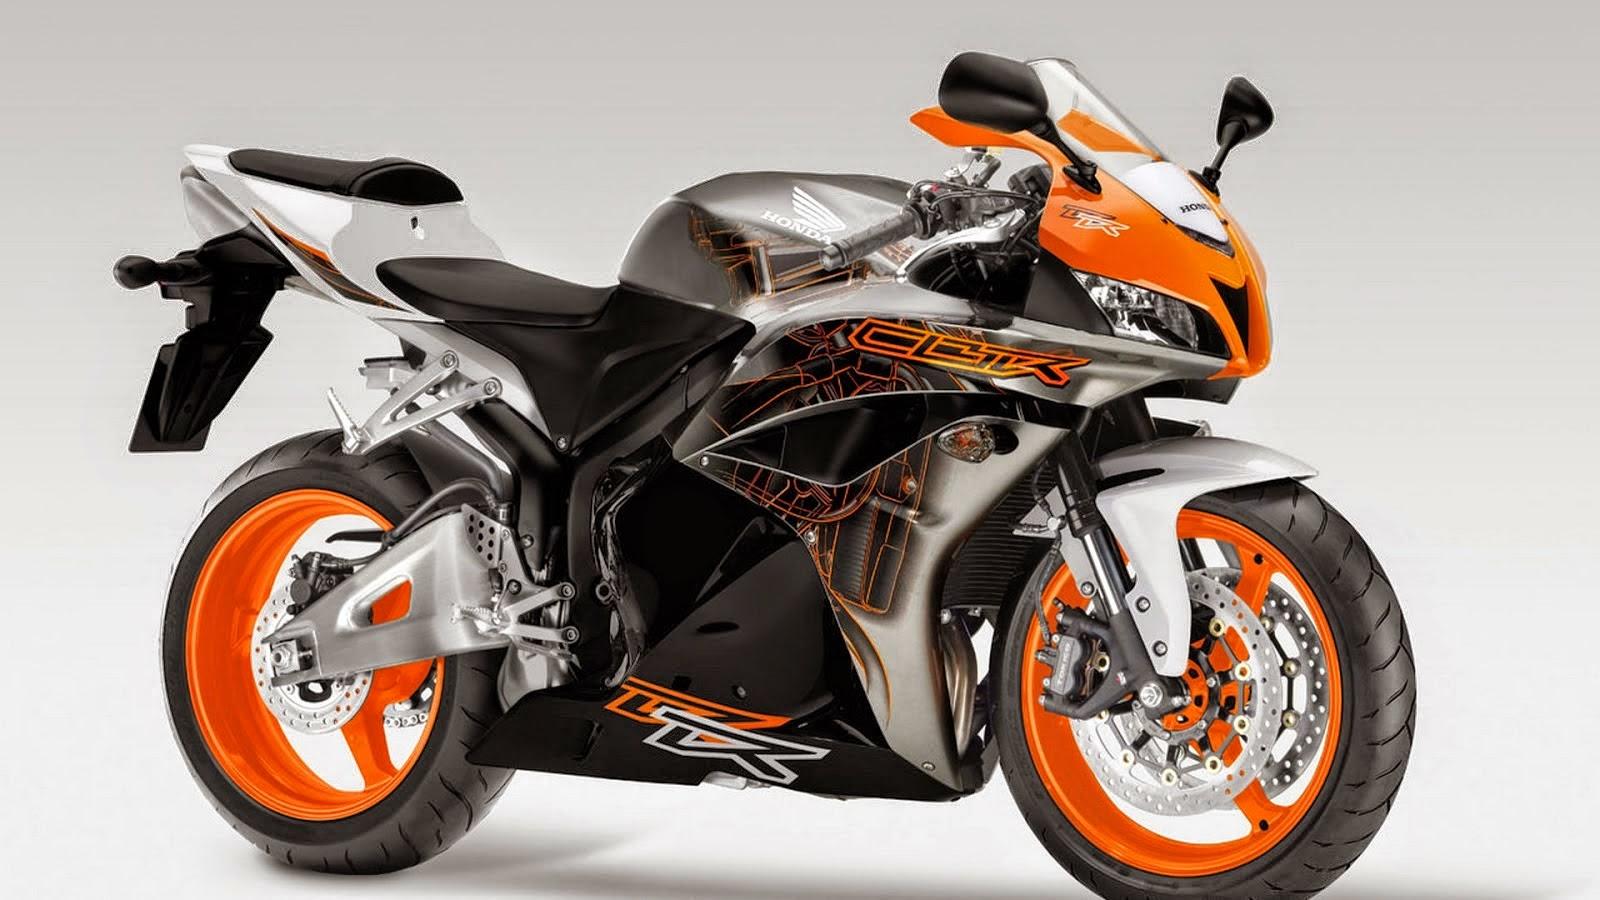 110 Modifikasi Motor Cb 150 R 2015 Modifikasi Motor Honda CB Terbaru